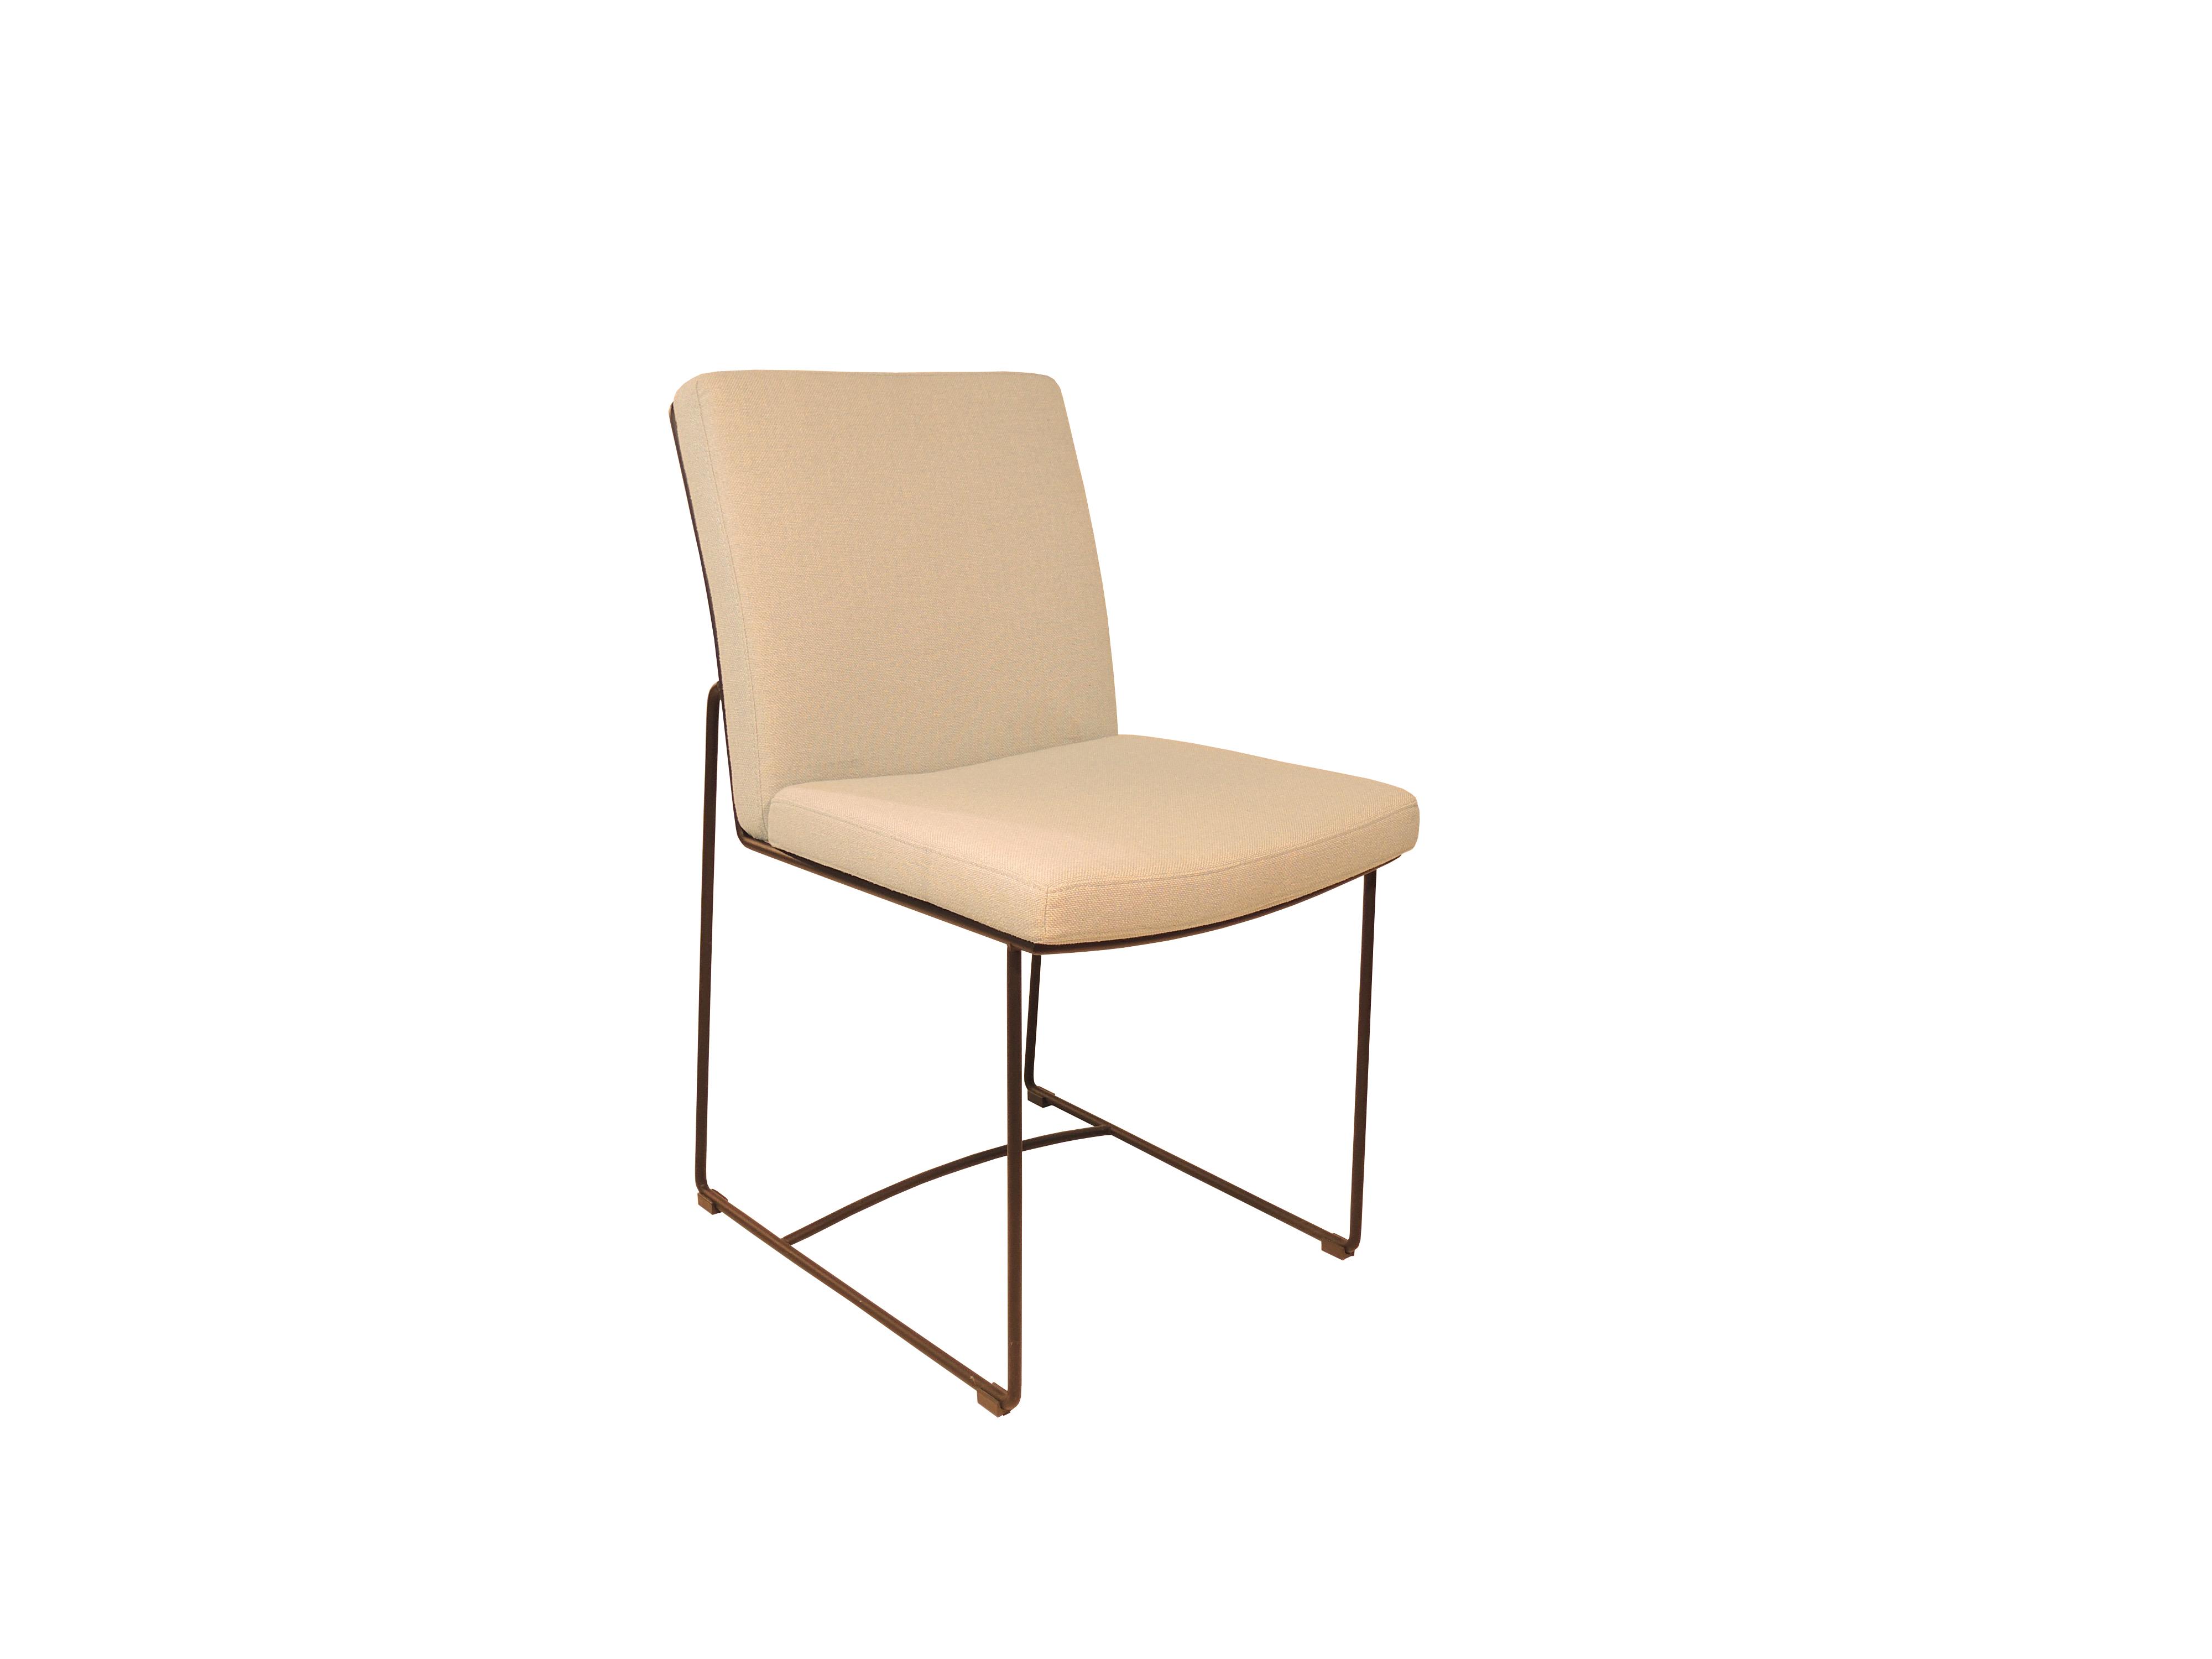 Zandro - Eetkamerstoel perfect zitcomfort